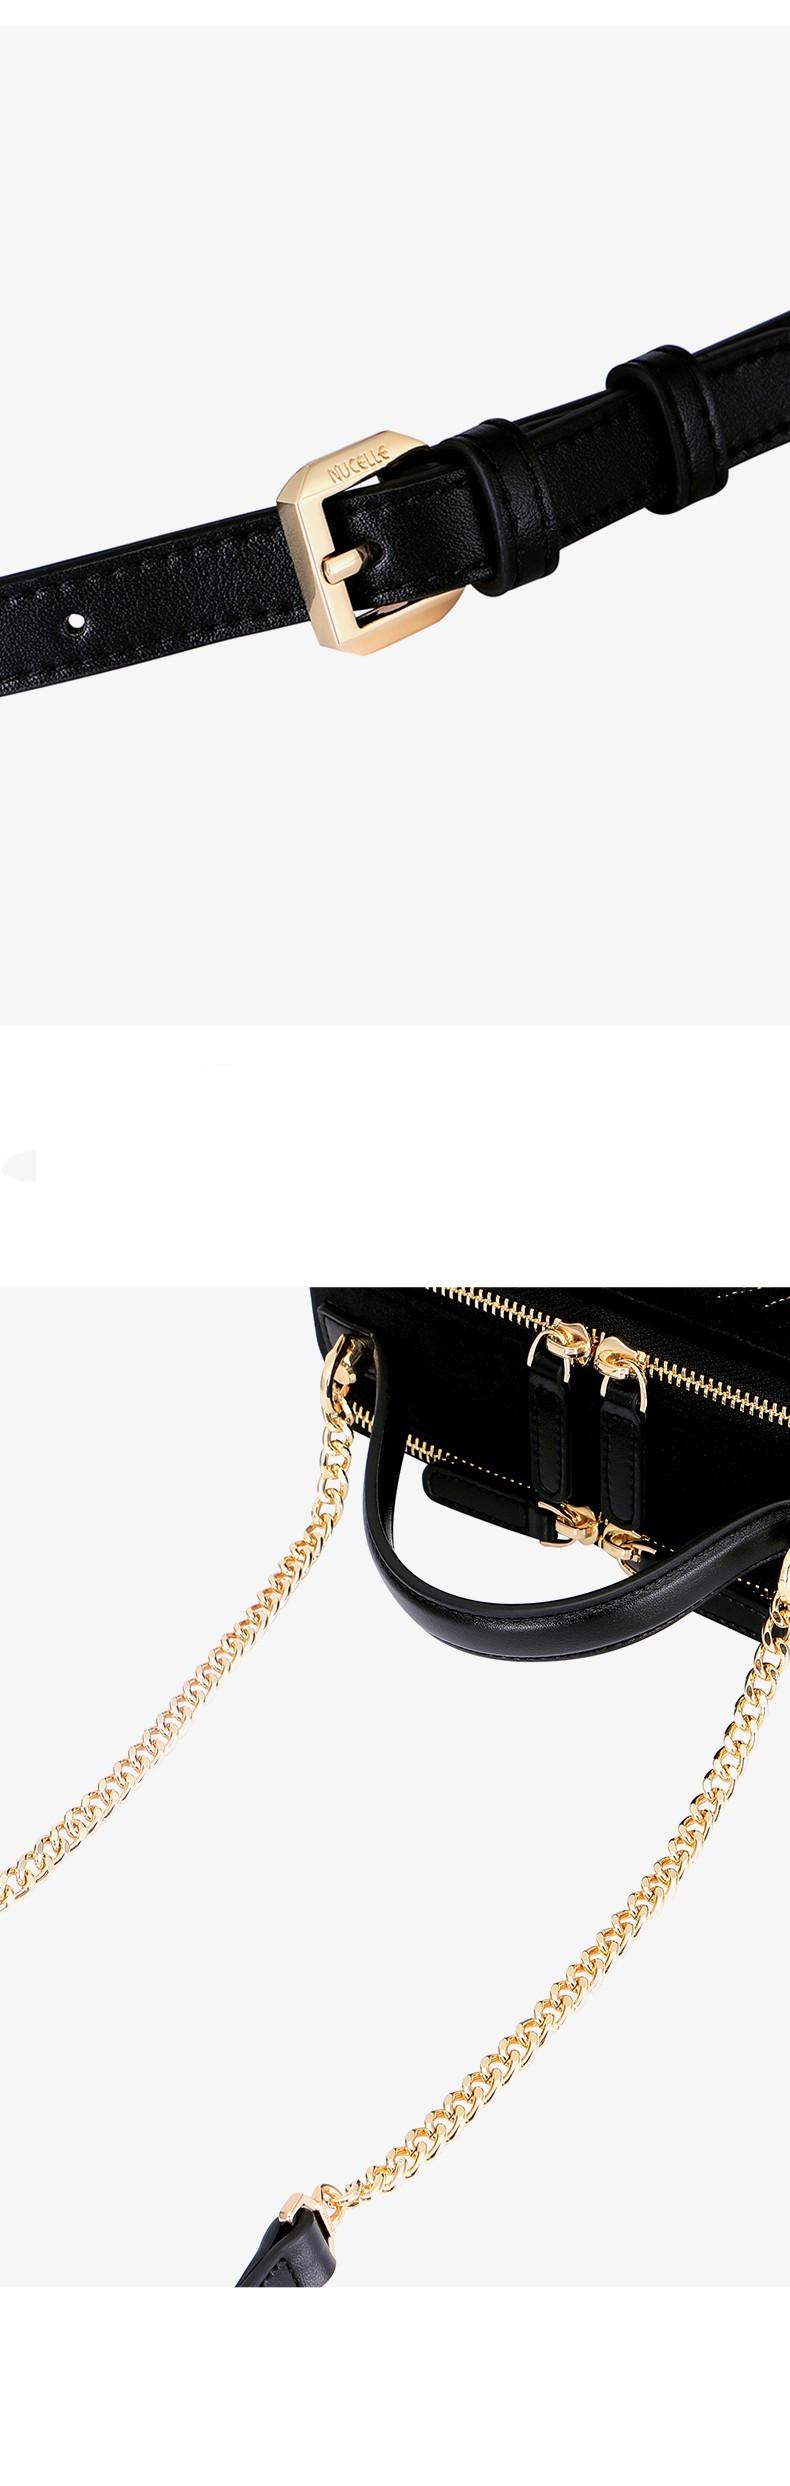 Túi xách nữ thời trang Nucelle Virgo VG597